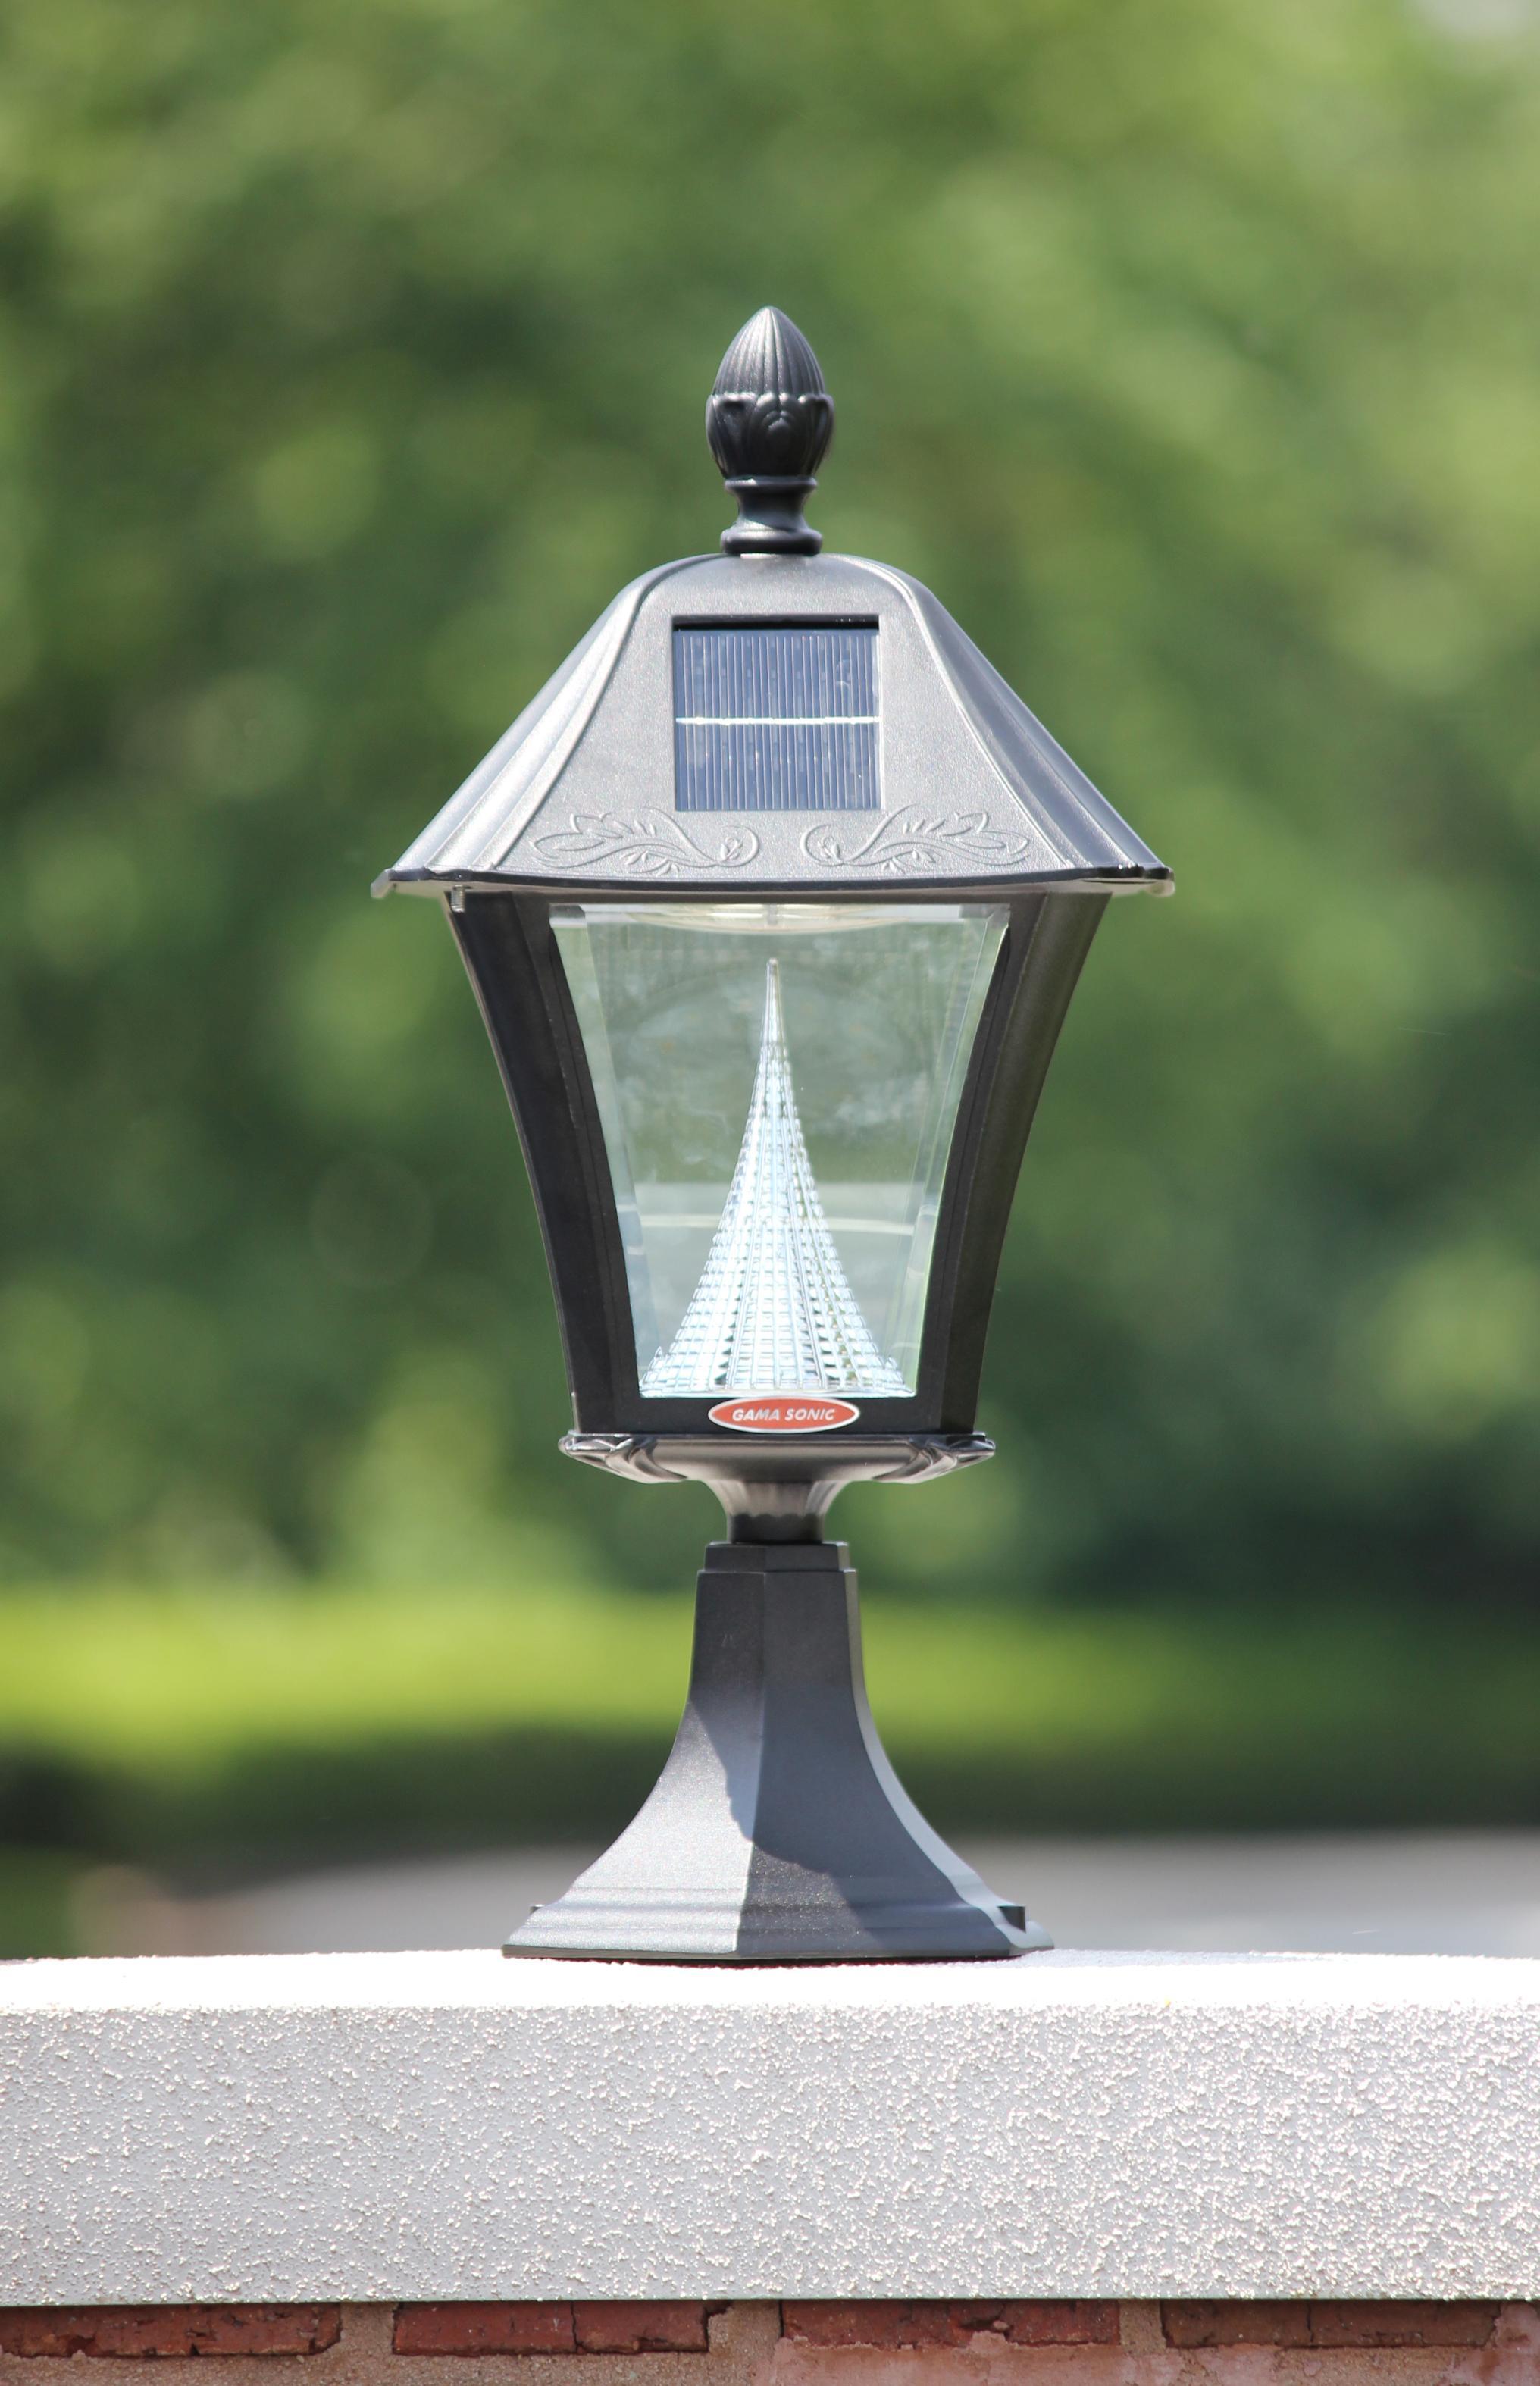 Amazon.com : Gama Sonic Baytown Solar Outdoor LED Light Fixture, Pole